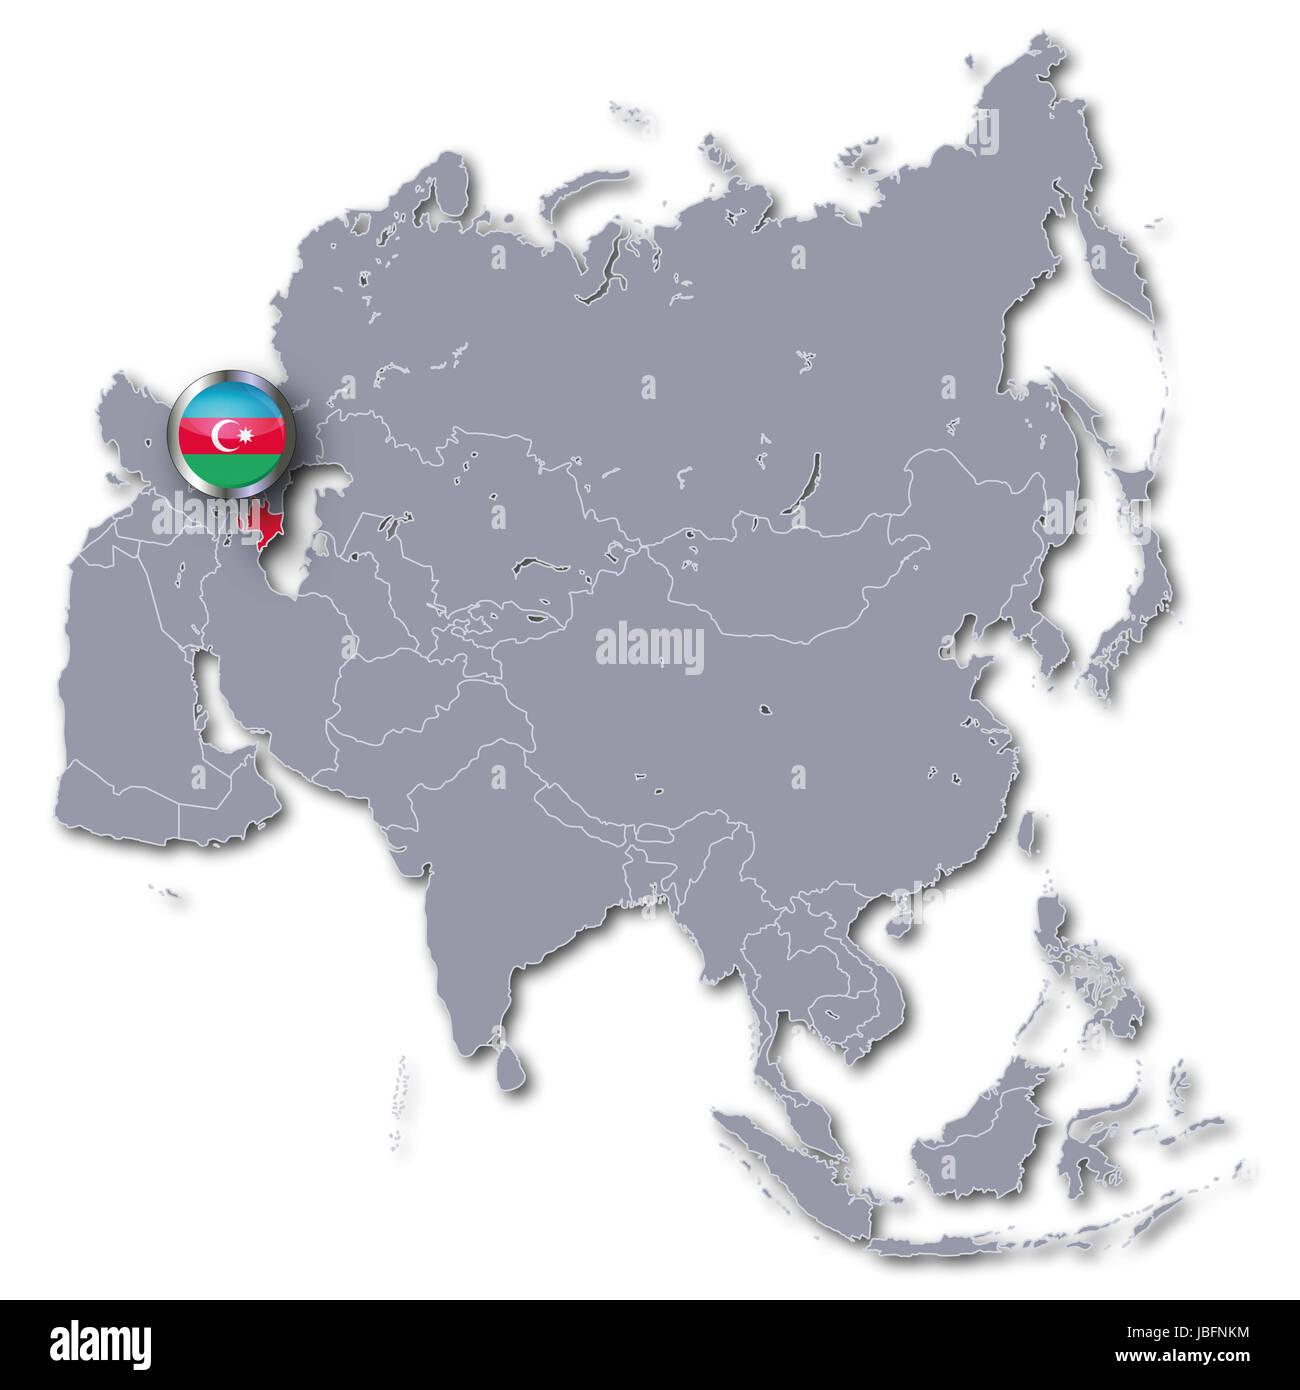 asia map with azerbaijan Stock Photo Royalty Free Image 144790456